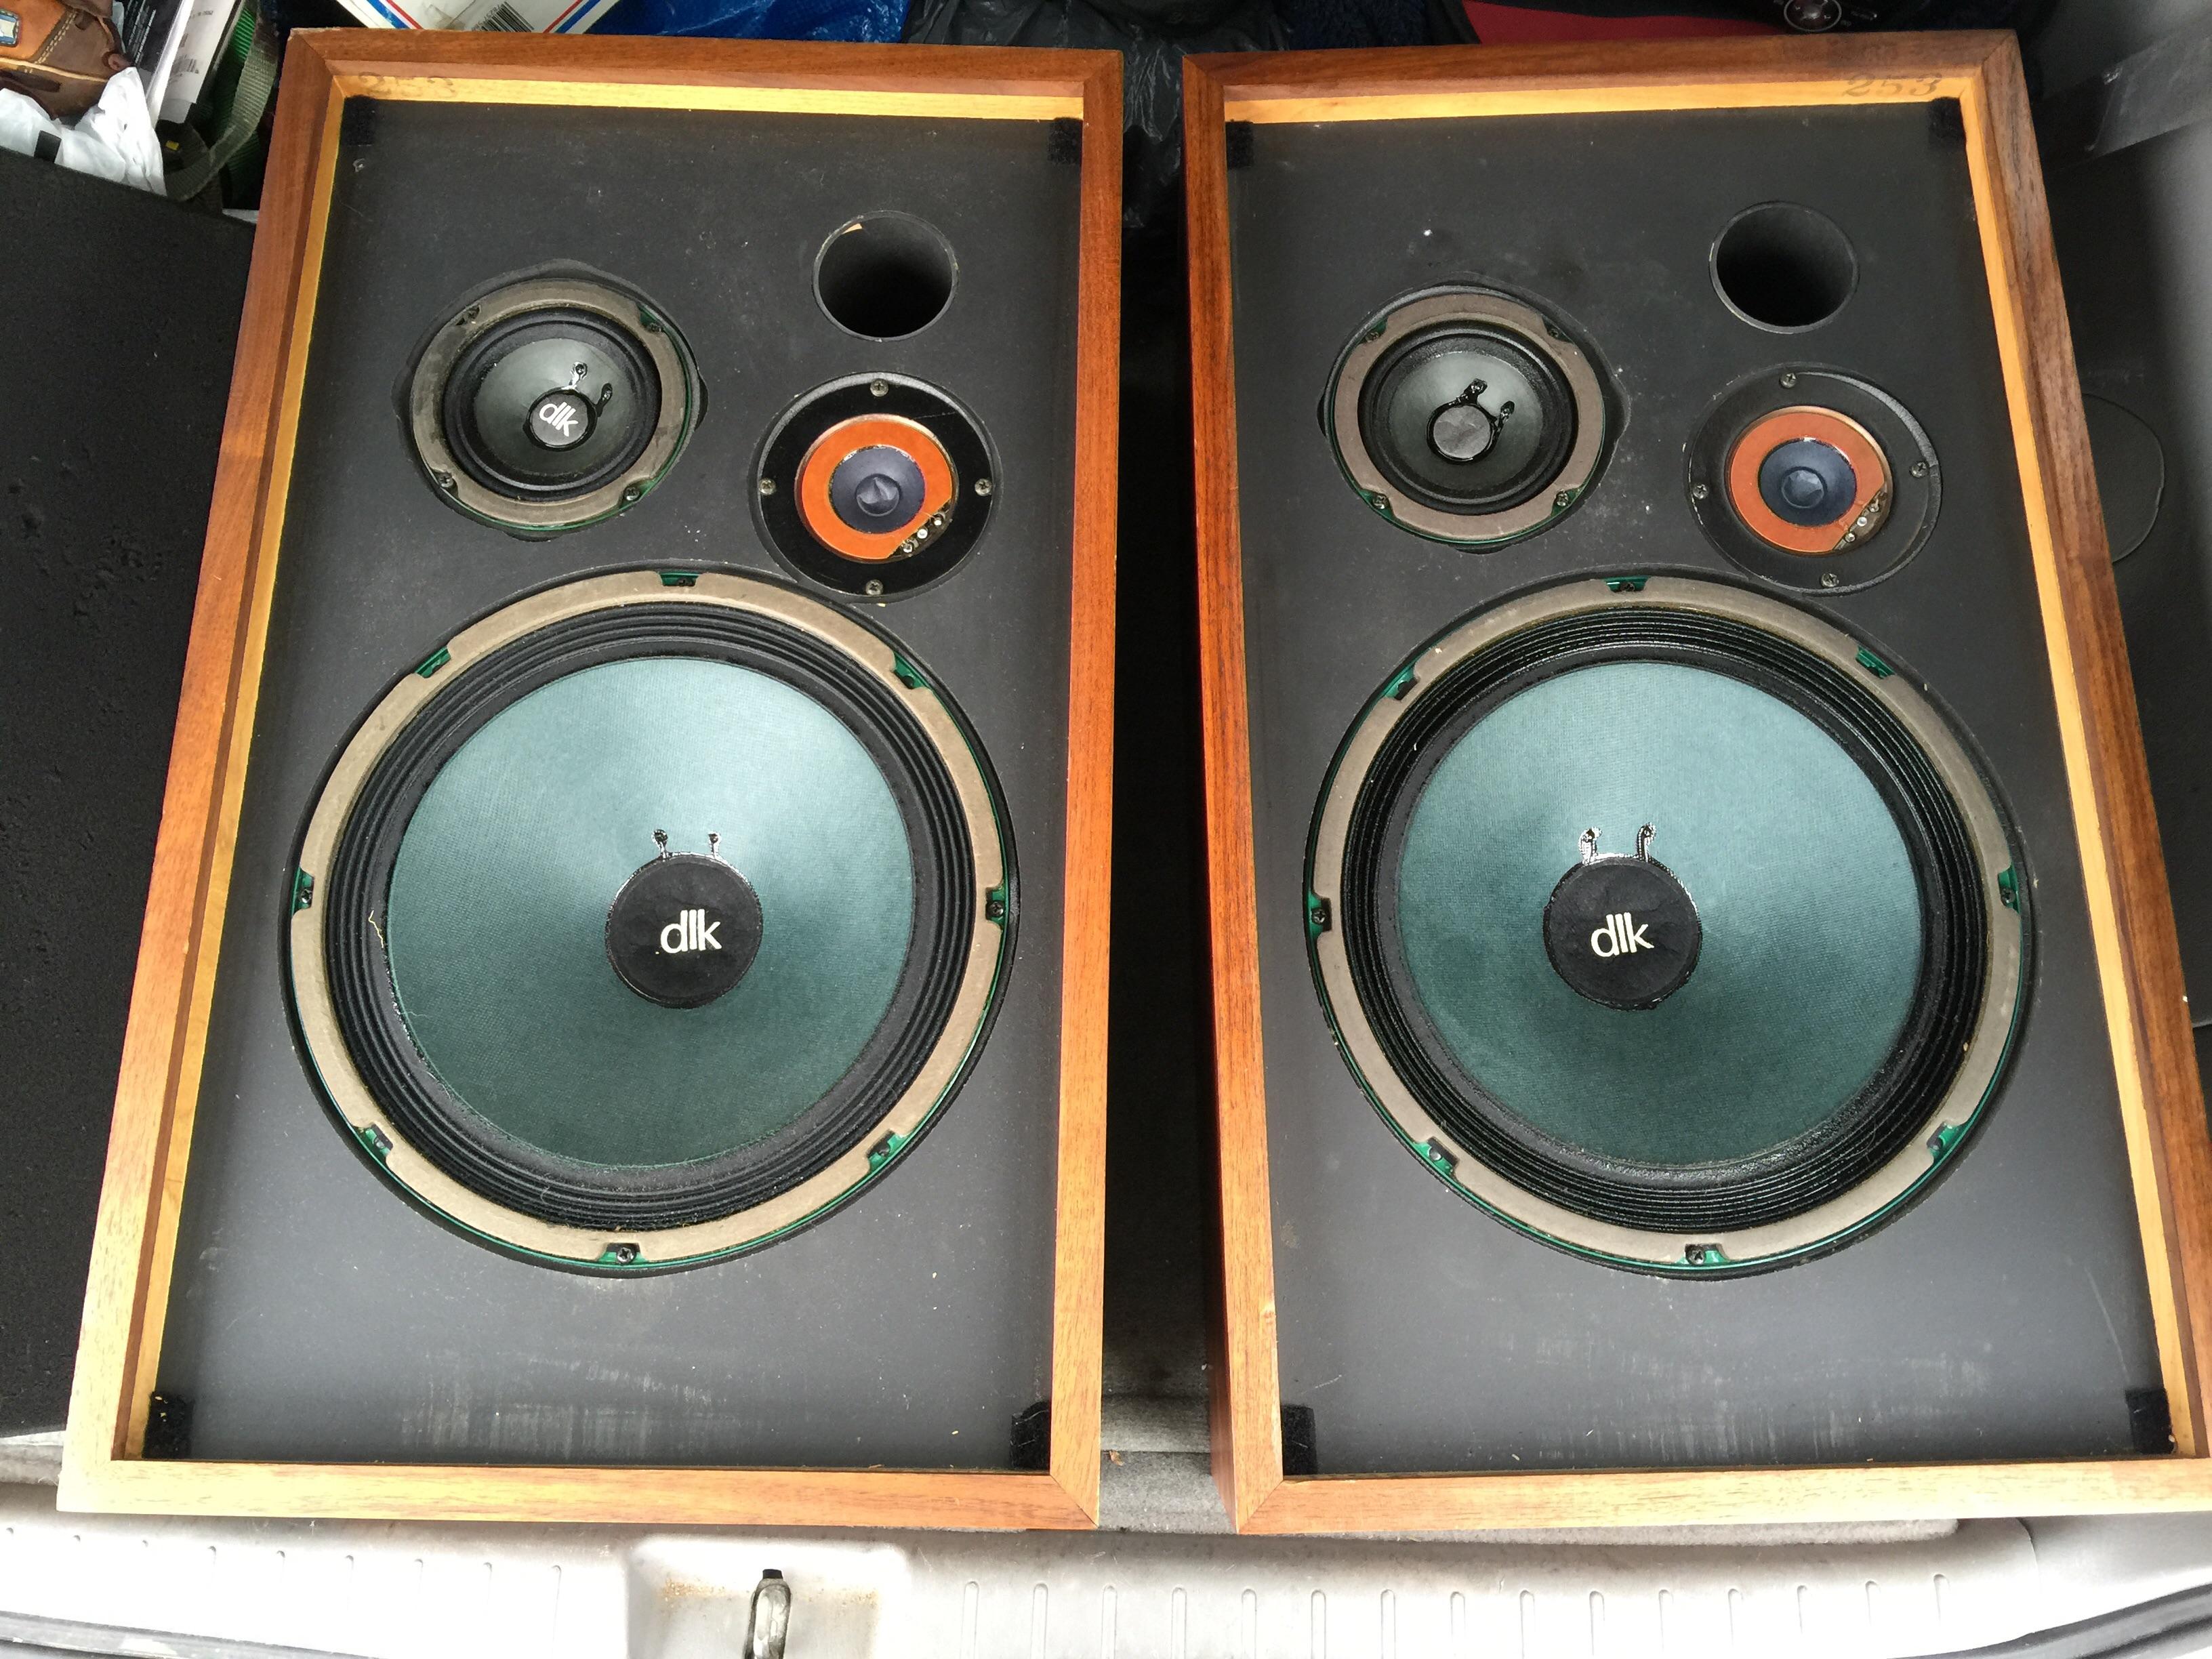 Dlk Model 2 Speakers Local Twin Cities Pick Up Polk Audio